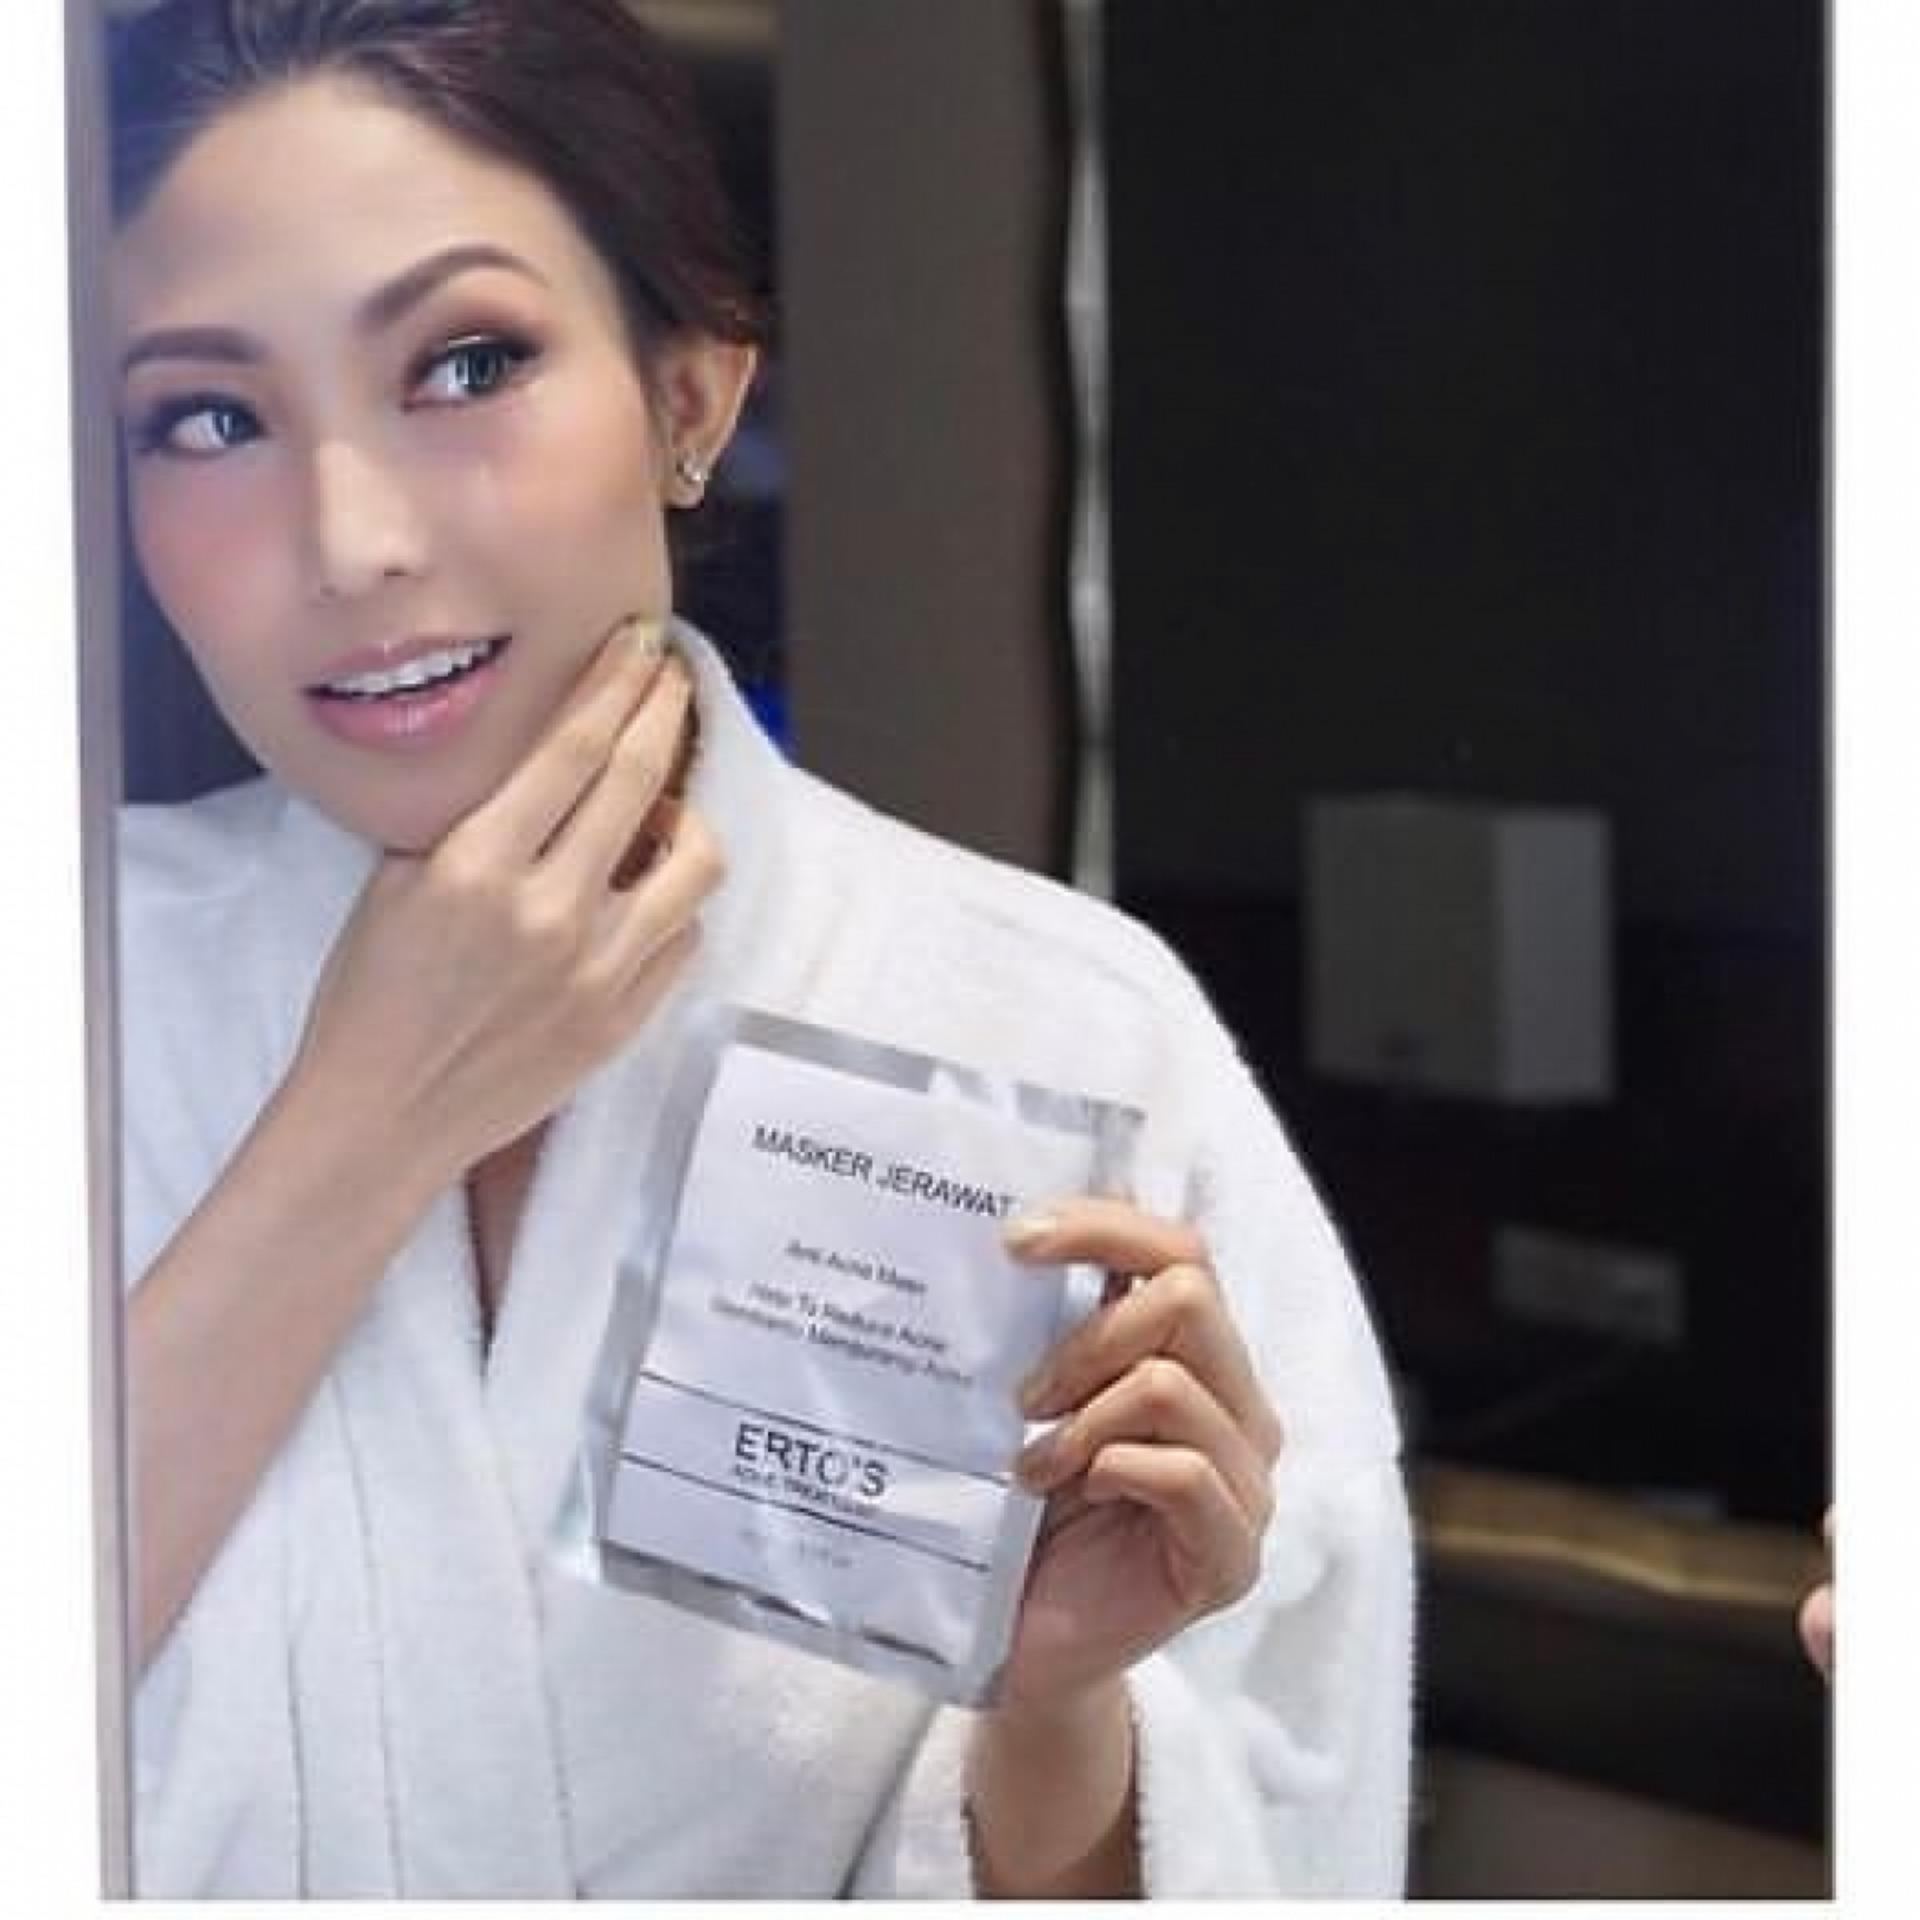 Cek Harga Baru 2 Pcs Ertos Masker Jerawat Original Bpom 100 Ampuh Pembersih Wajah Anti Acne Face Mask Skincare